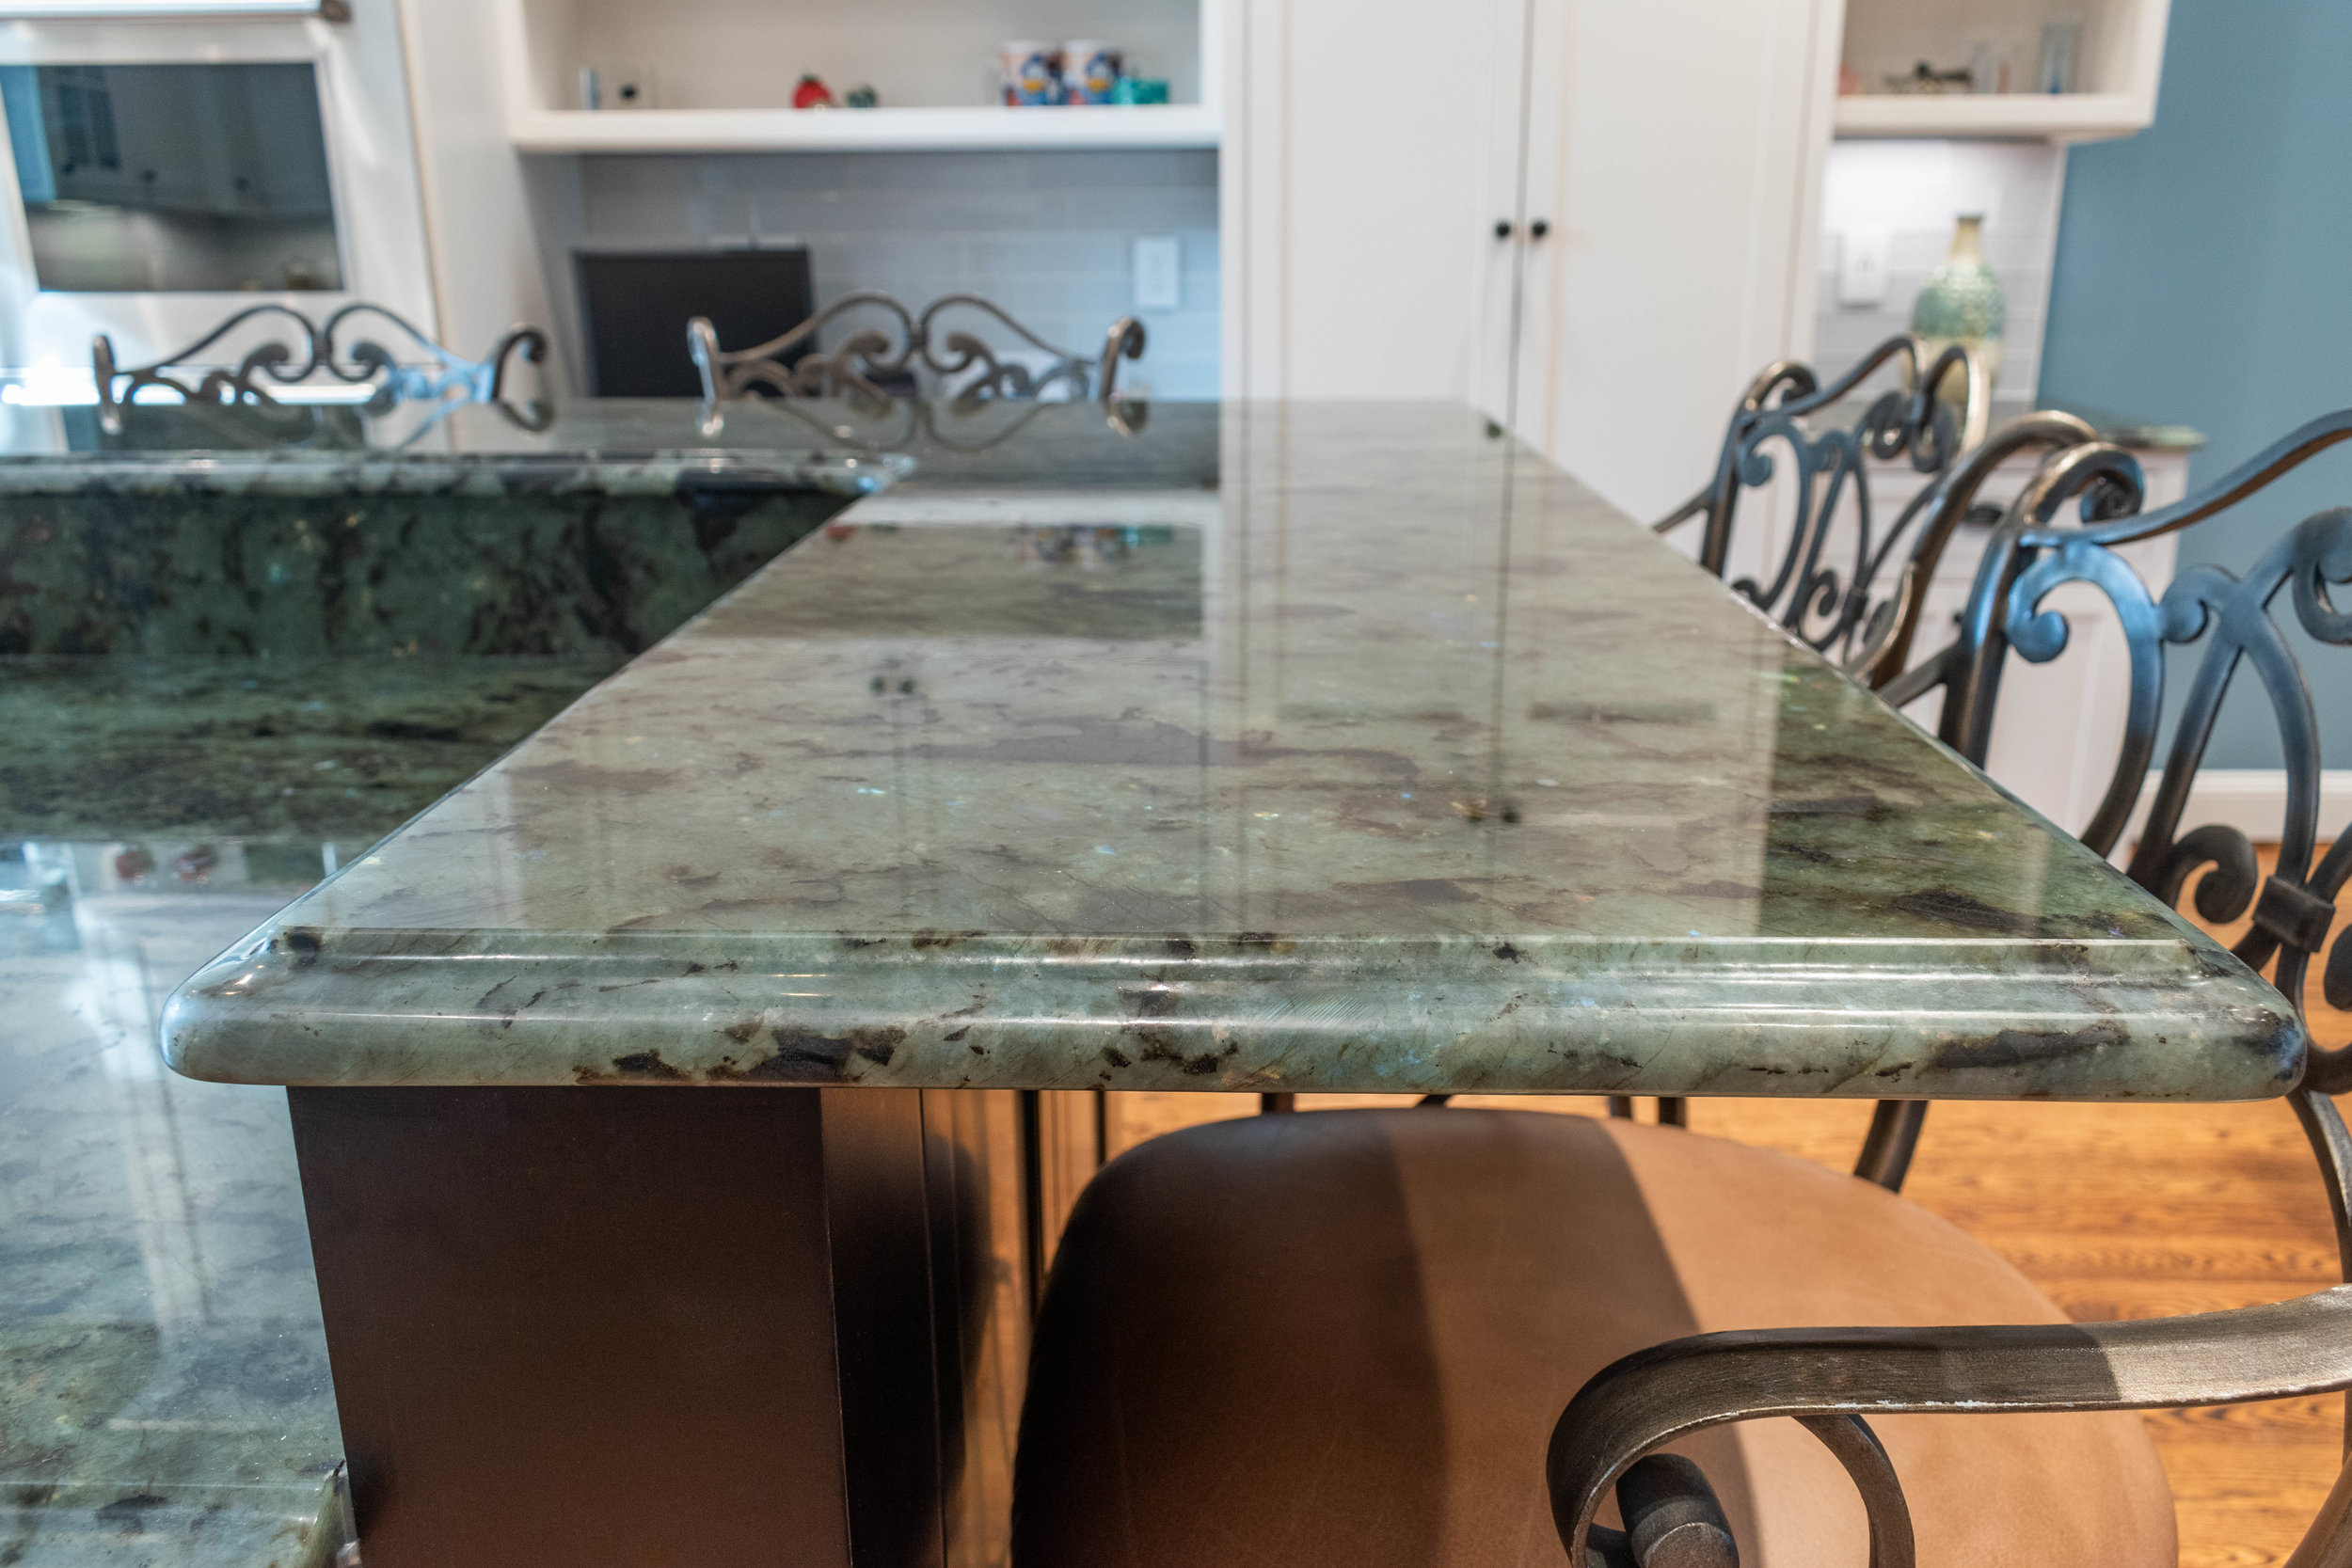 Material: Labradorite Blue Flake  Thickness, Finish & Stone Type: 3CM Polished Granite  Edge: Ogee  Sink: ZP3016HMR